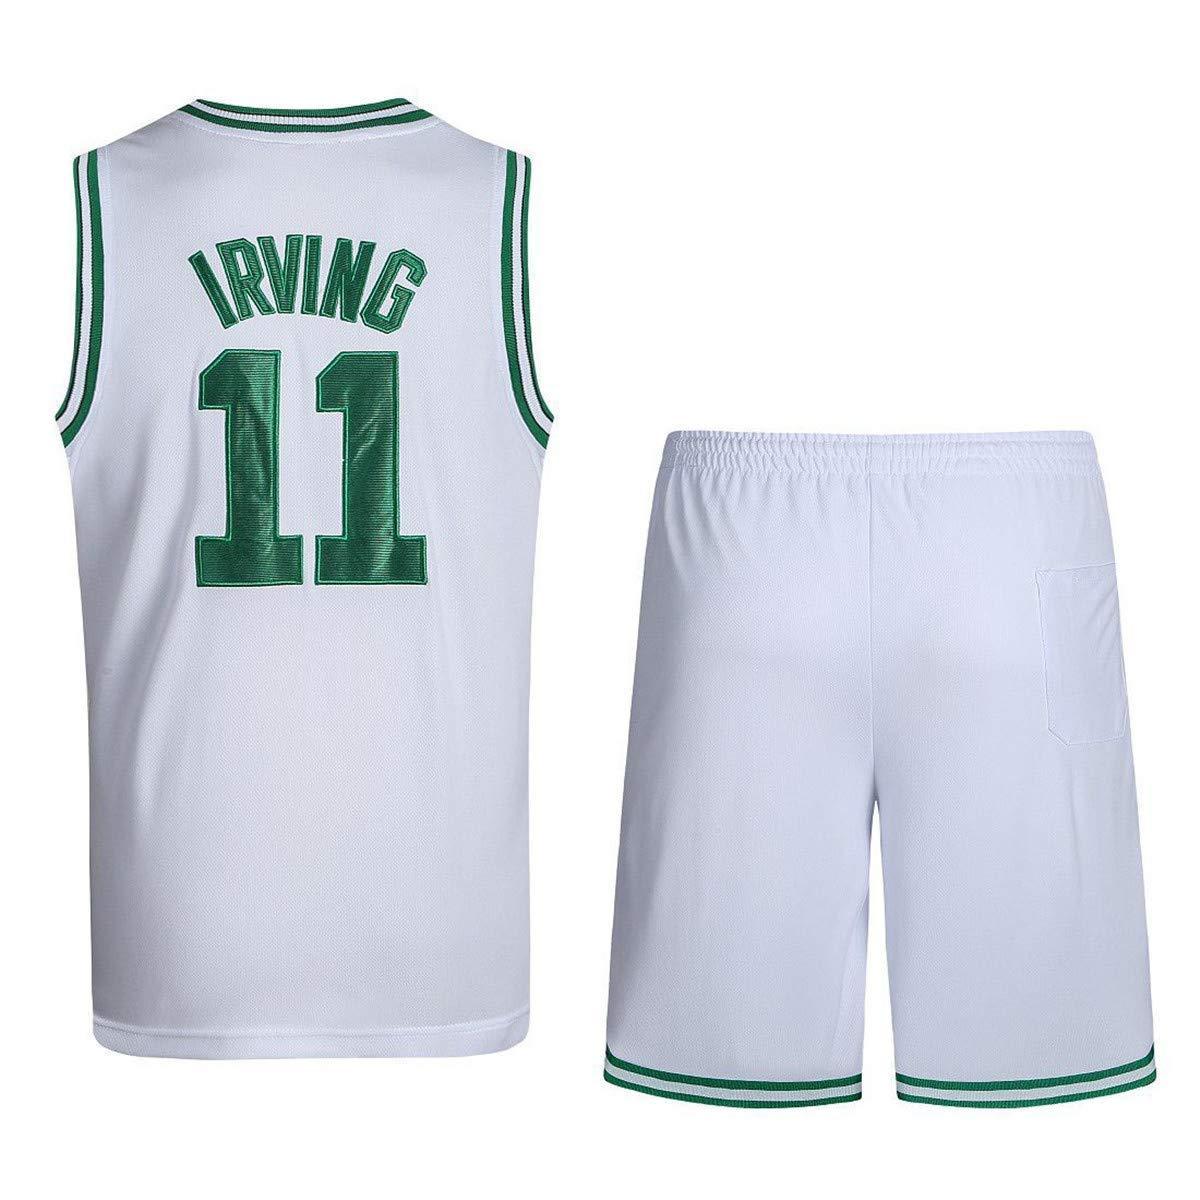 Maillots de Baloncesto - Camisetas de Baloncesto Kyrie Irving NO ...